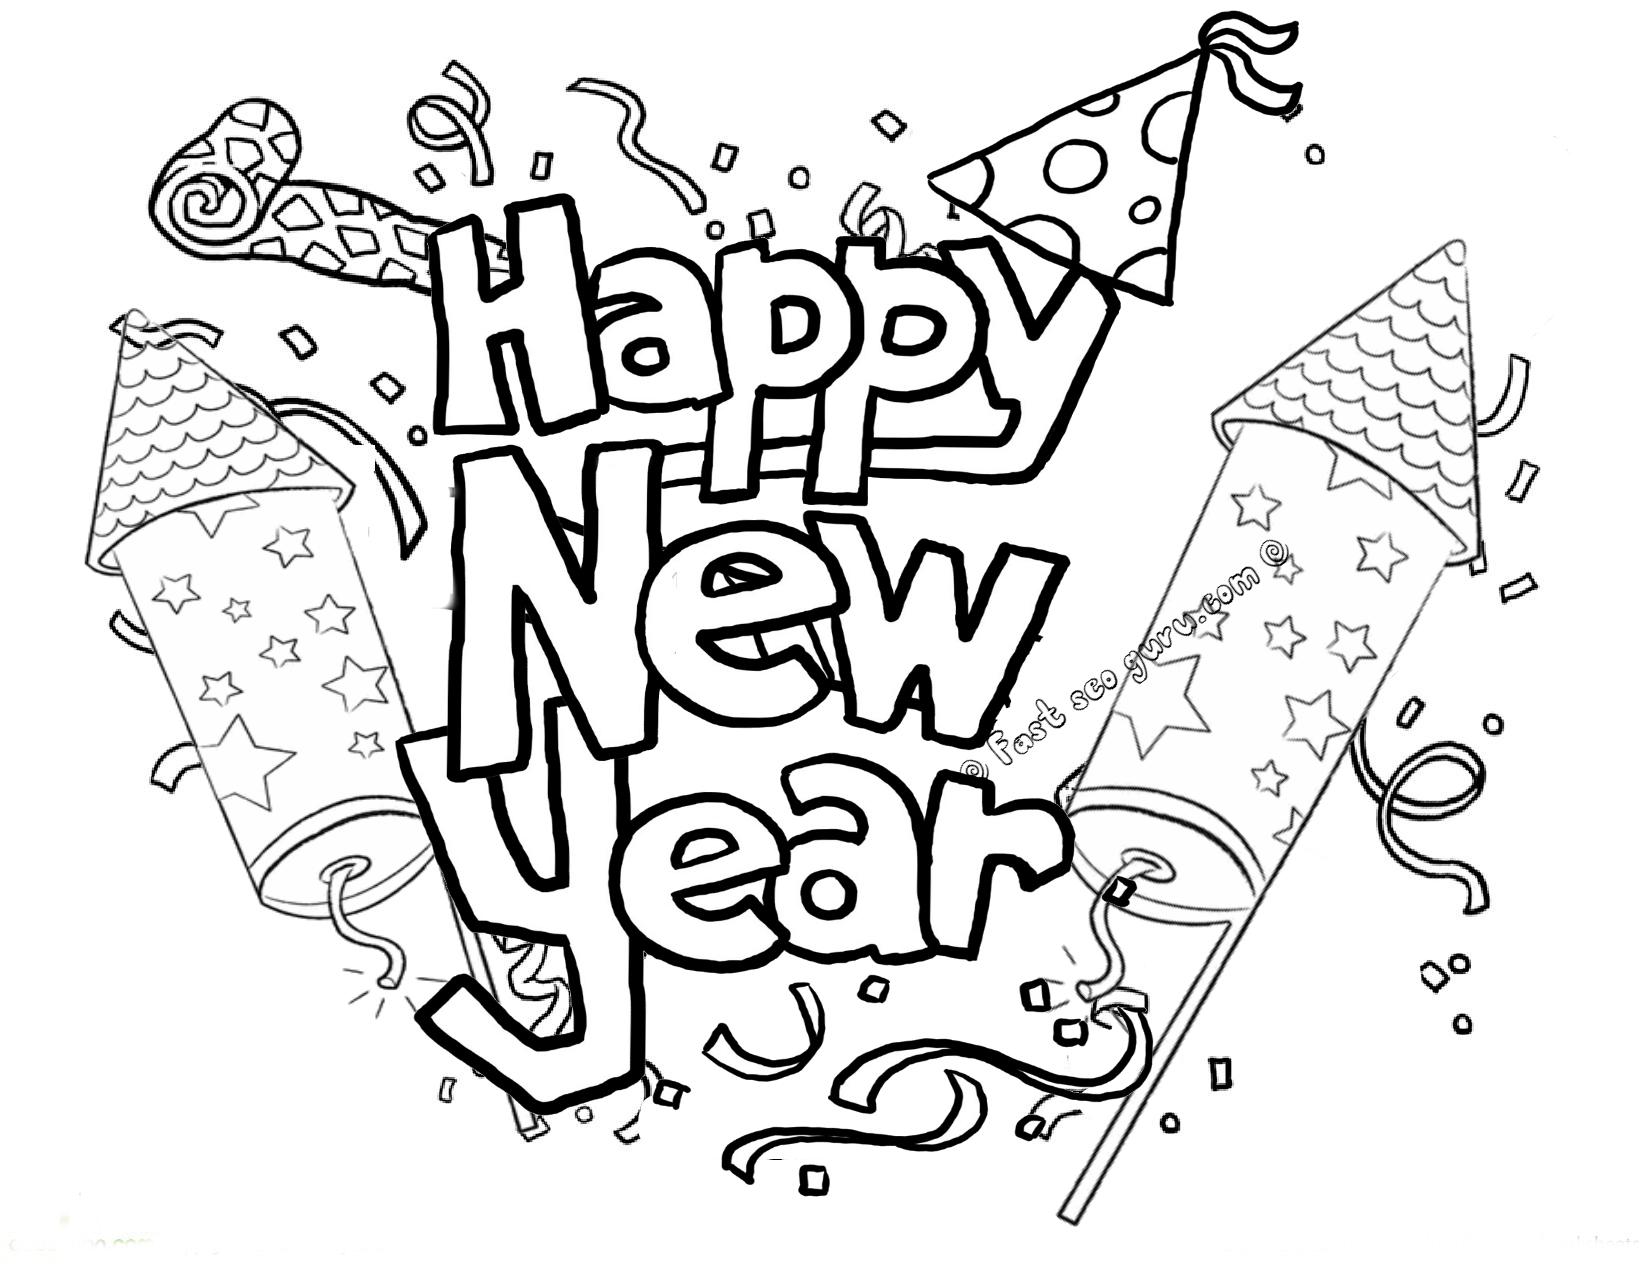 Joyful New Year Celebration Colouring Pages - Picolour